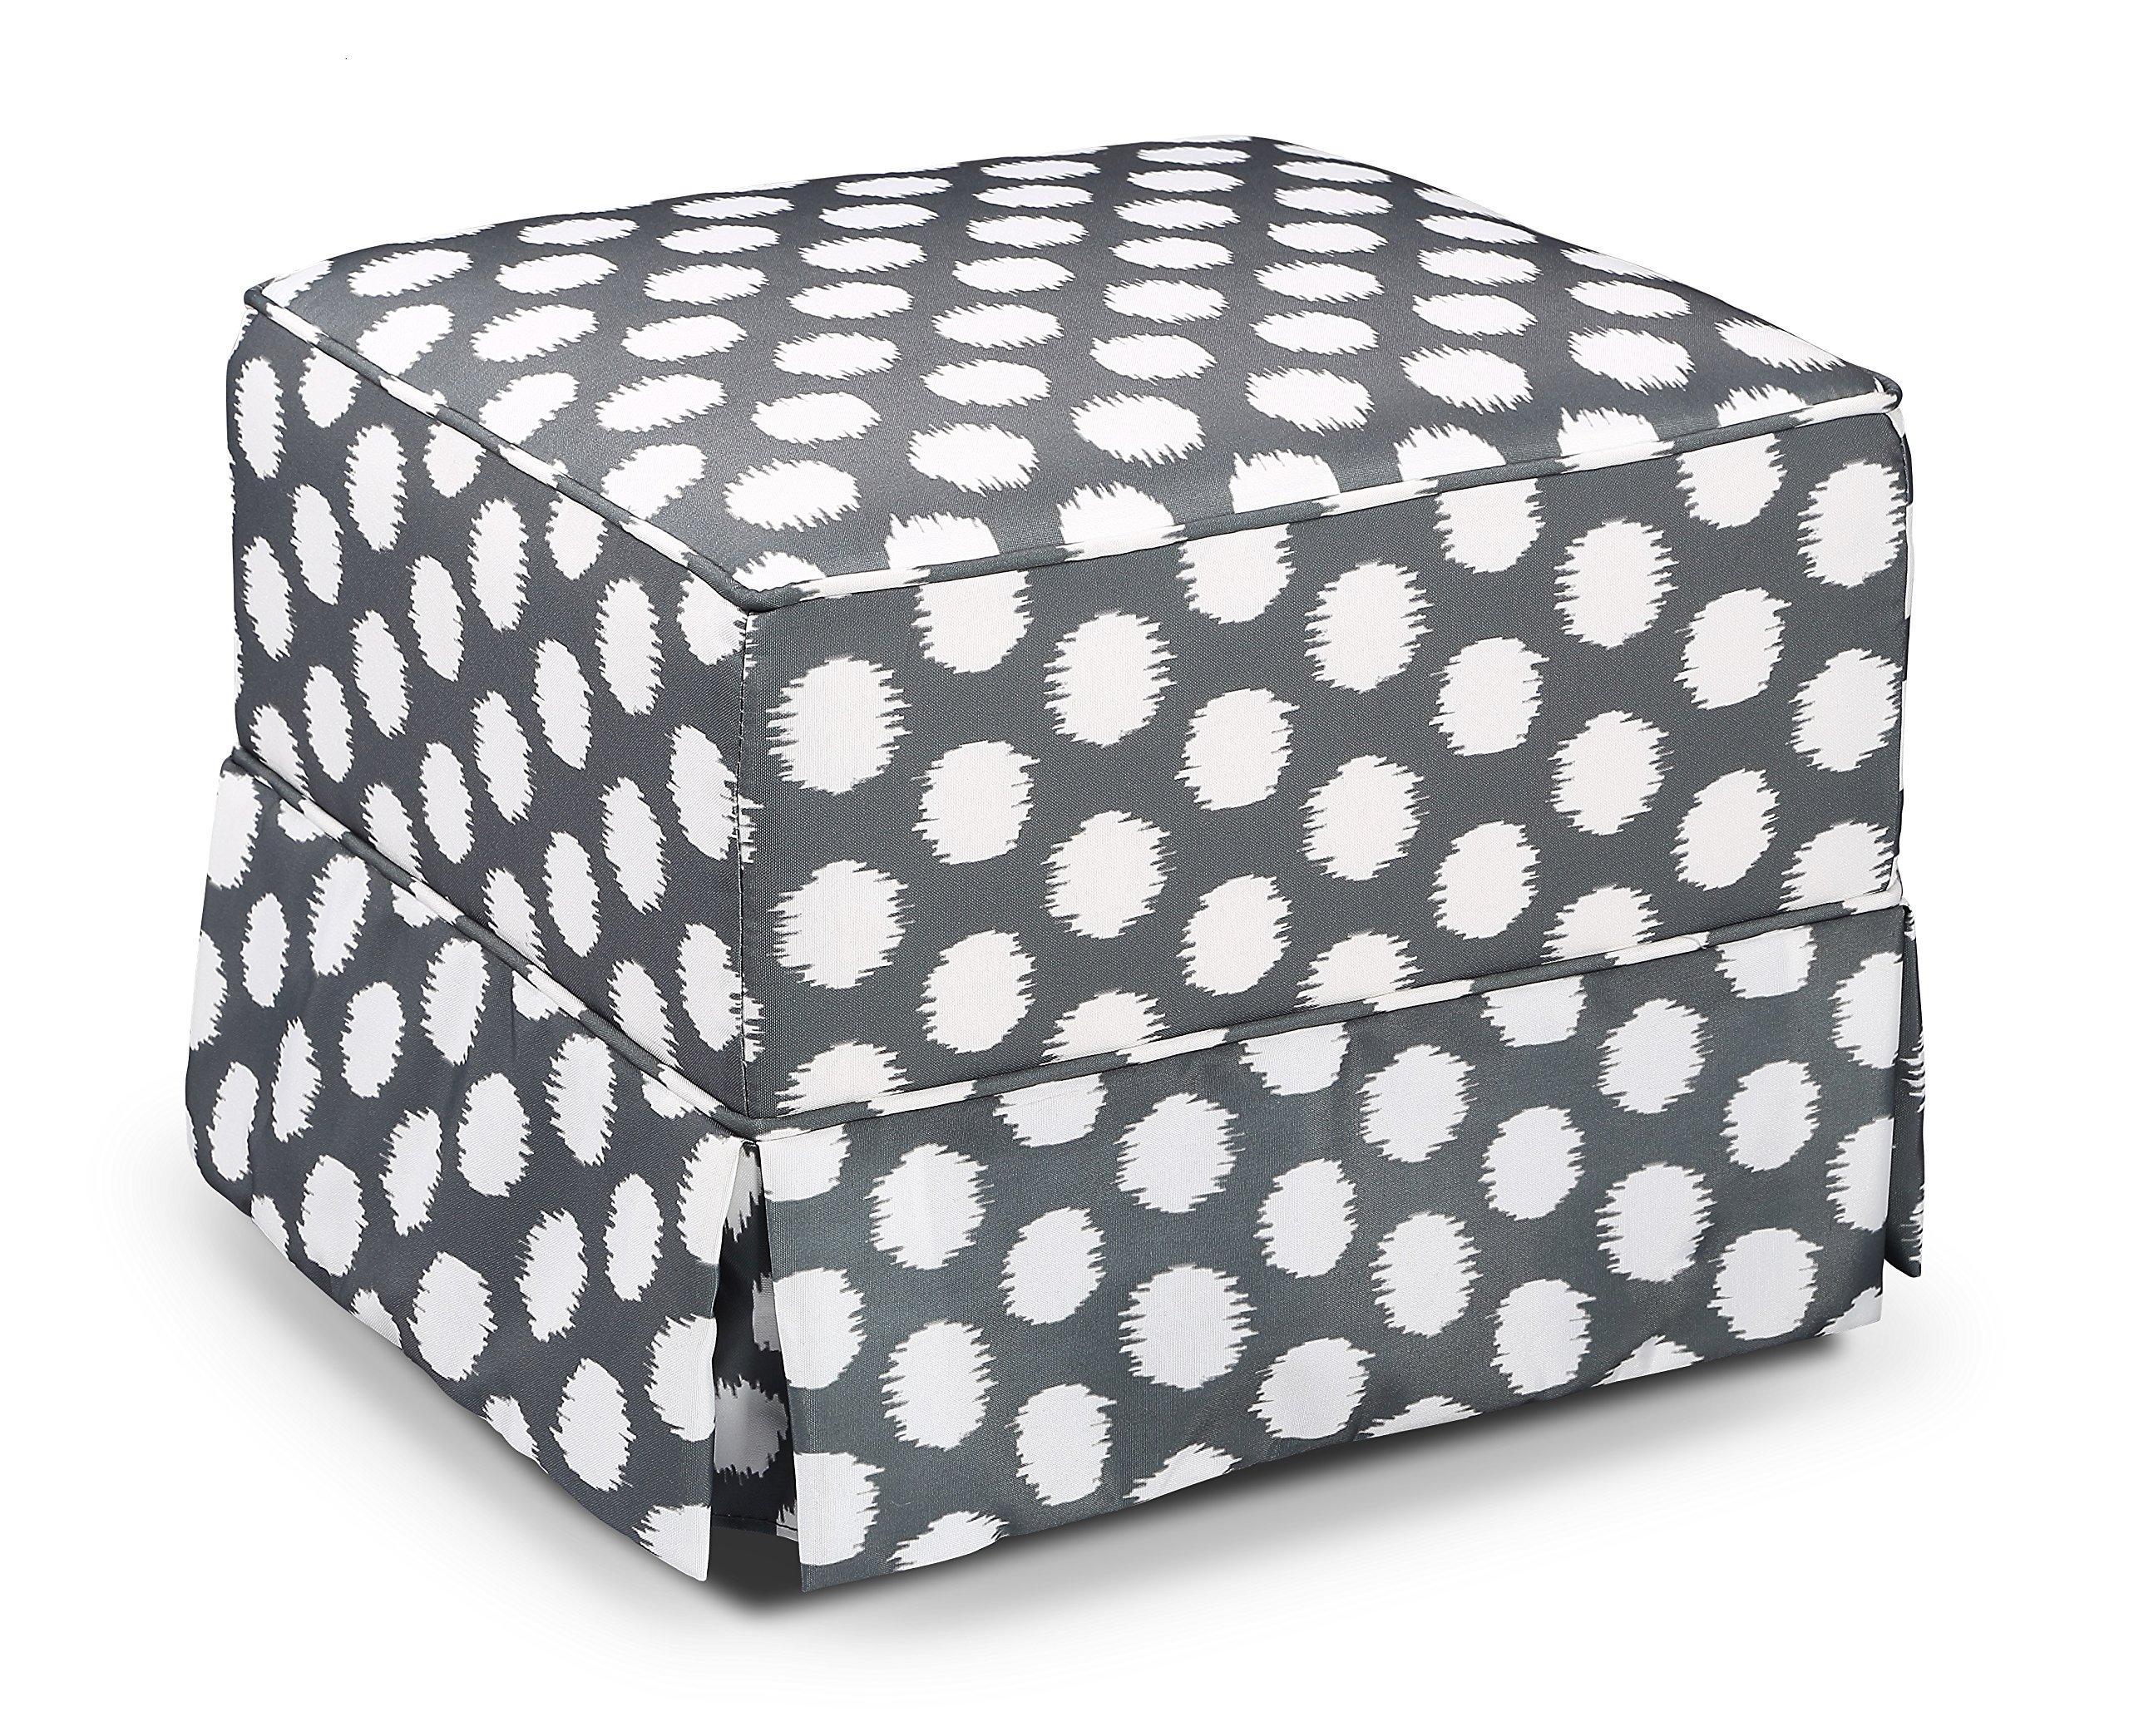 Storkcraft Polka Dot Upholstered Ottoman, Gray/White, Cleanable Upholstered Comfort Rocking Nursery Ottoman by Storkcraft